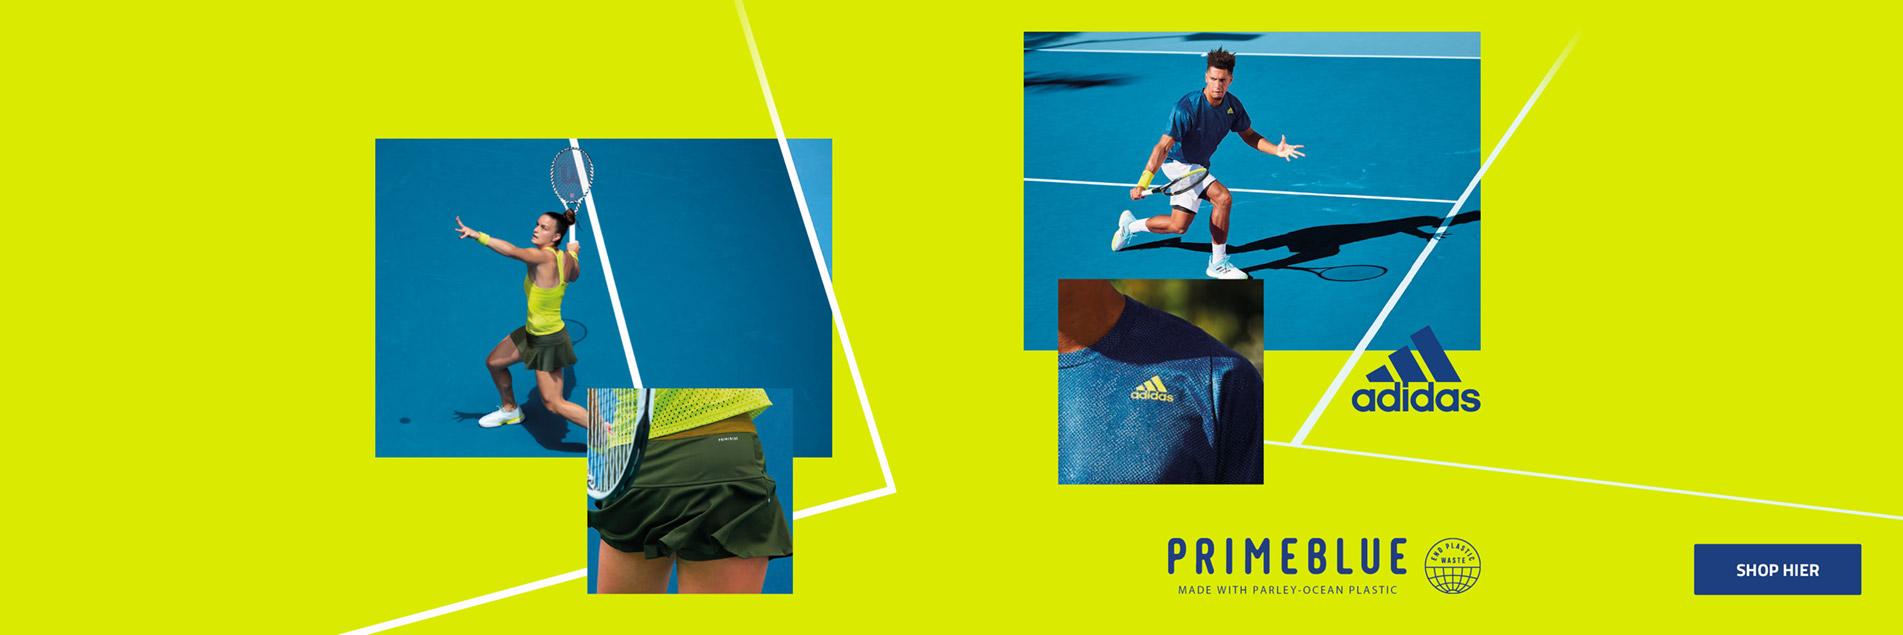 adidas Tennis x Primeblue